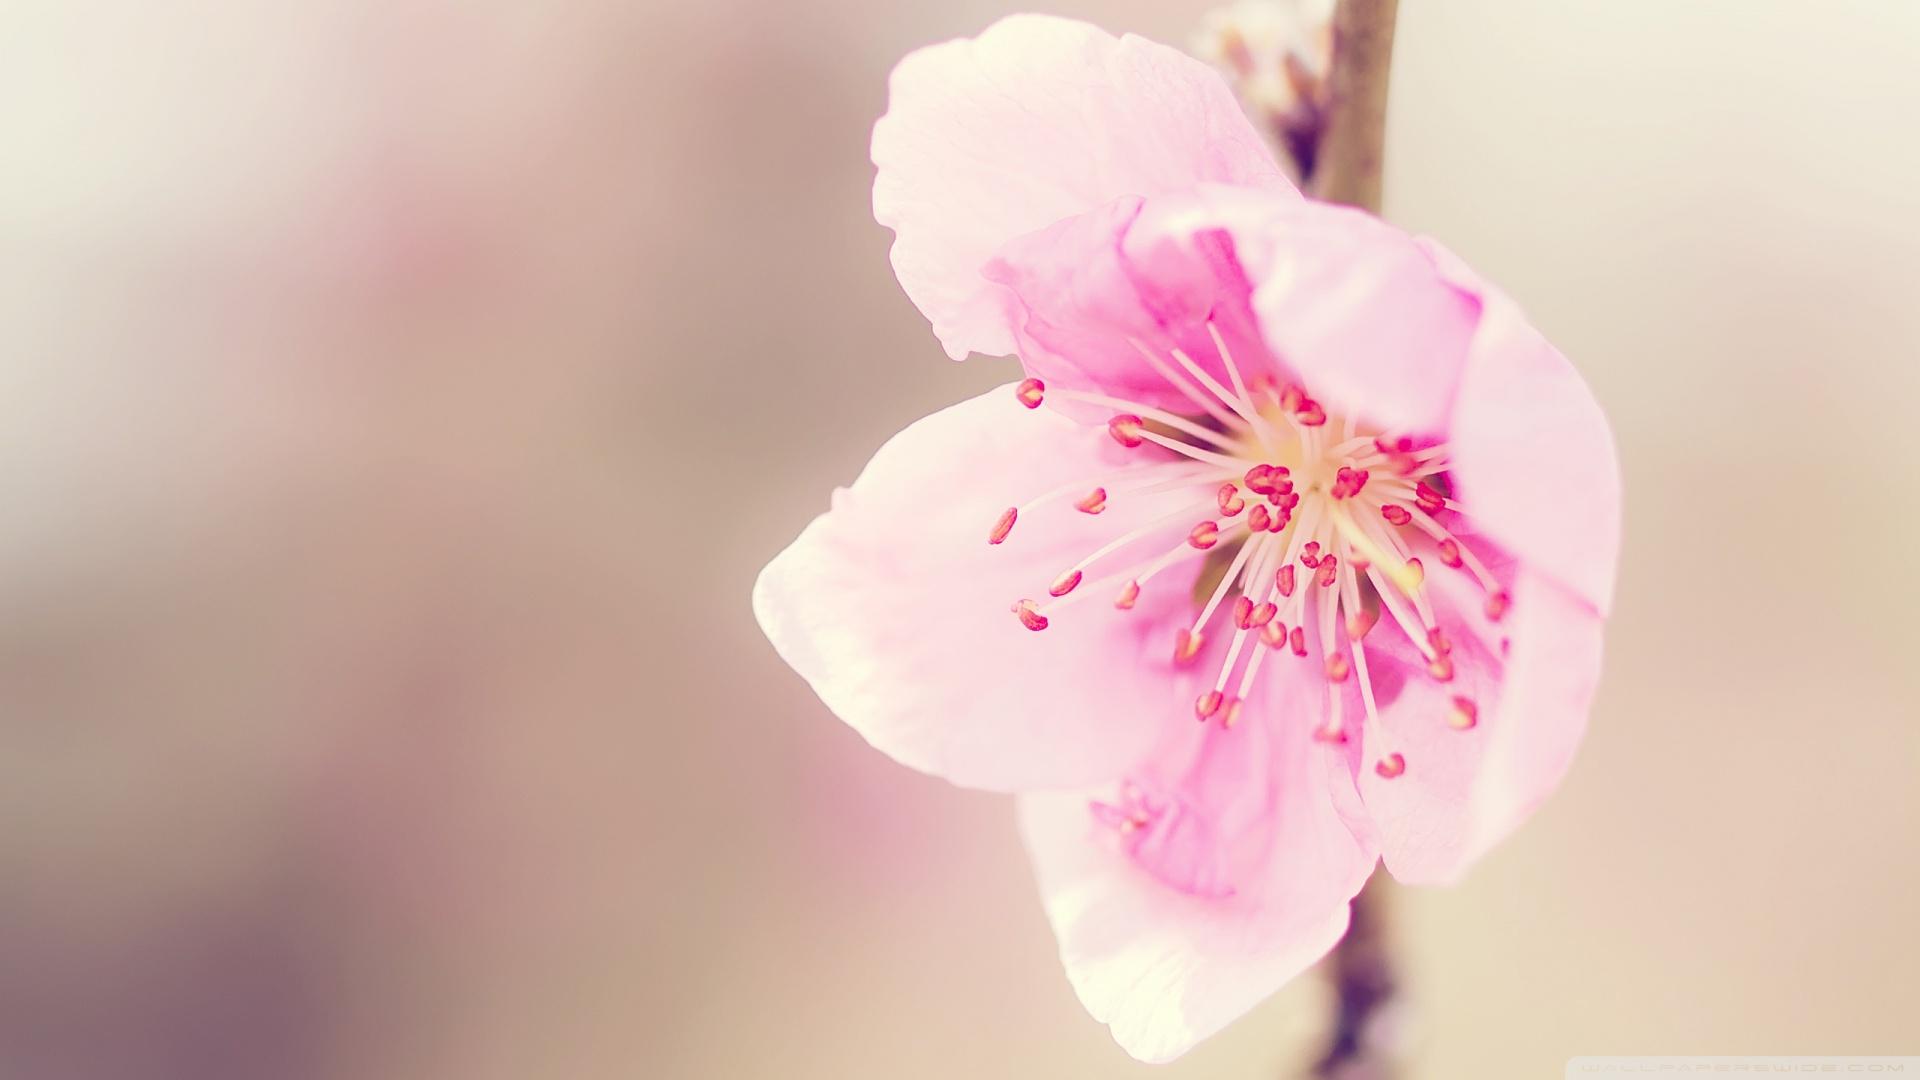 Pretty Pink Flower Wallpaper 1920x1080 Pretty Pink Flower 1920x1080